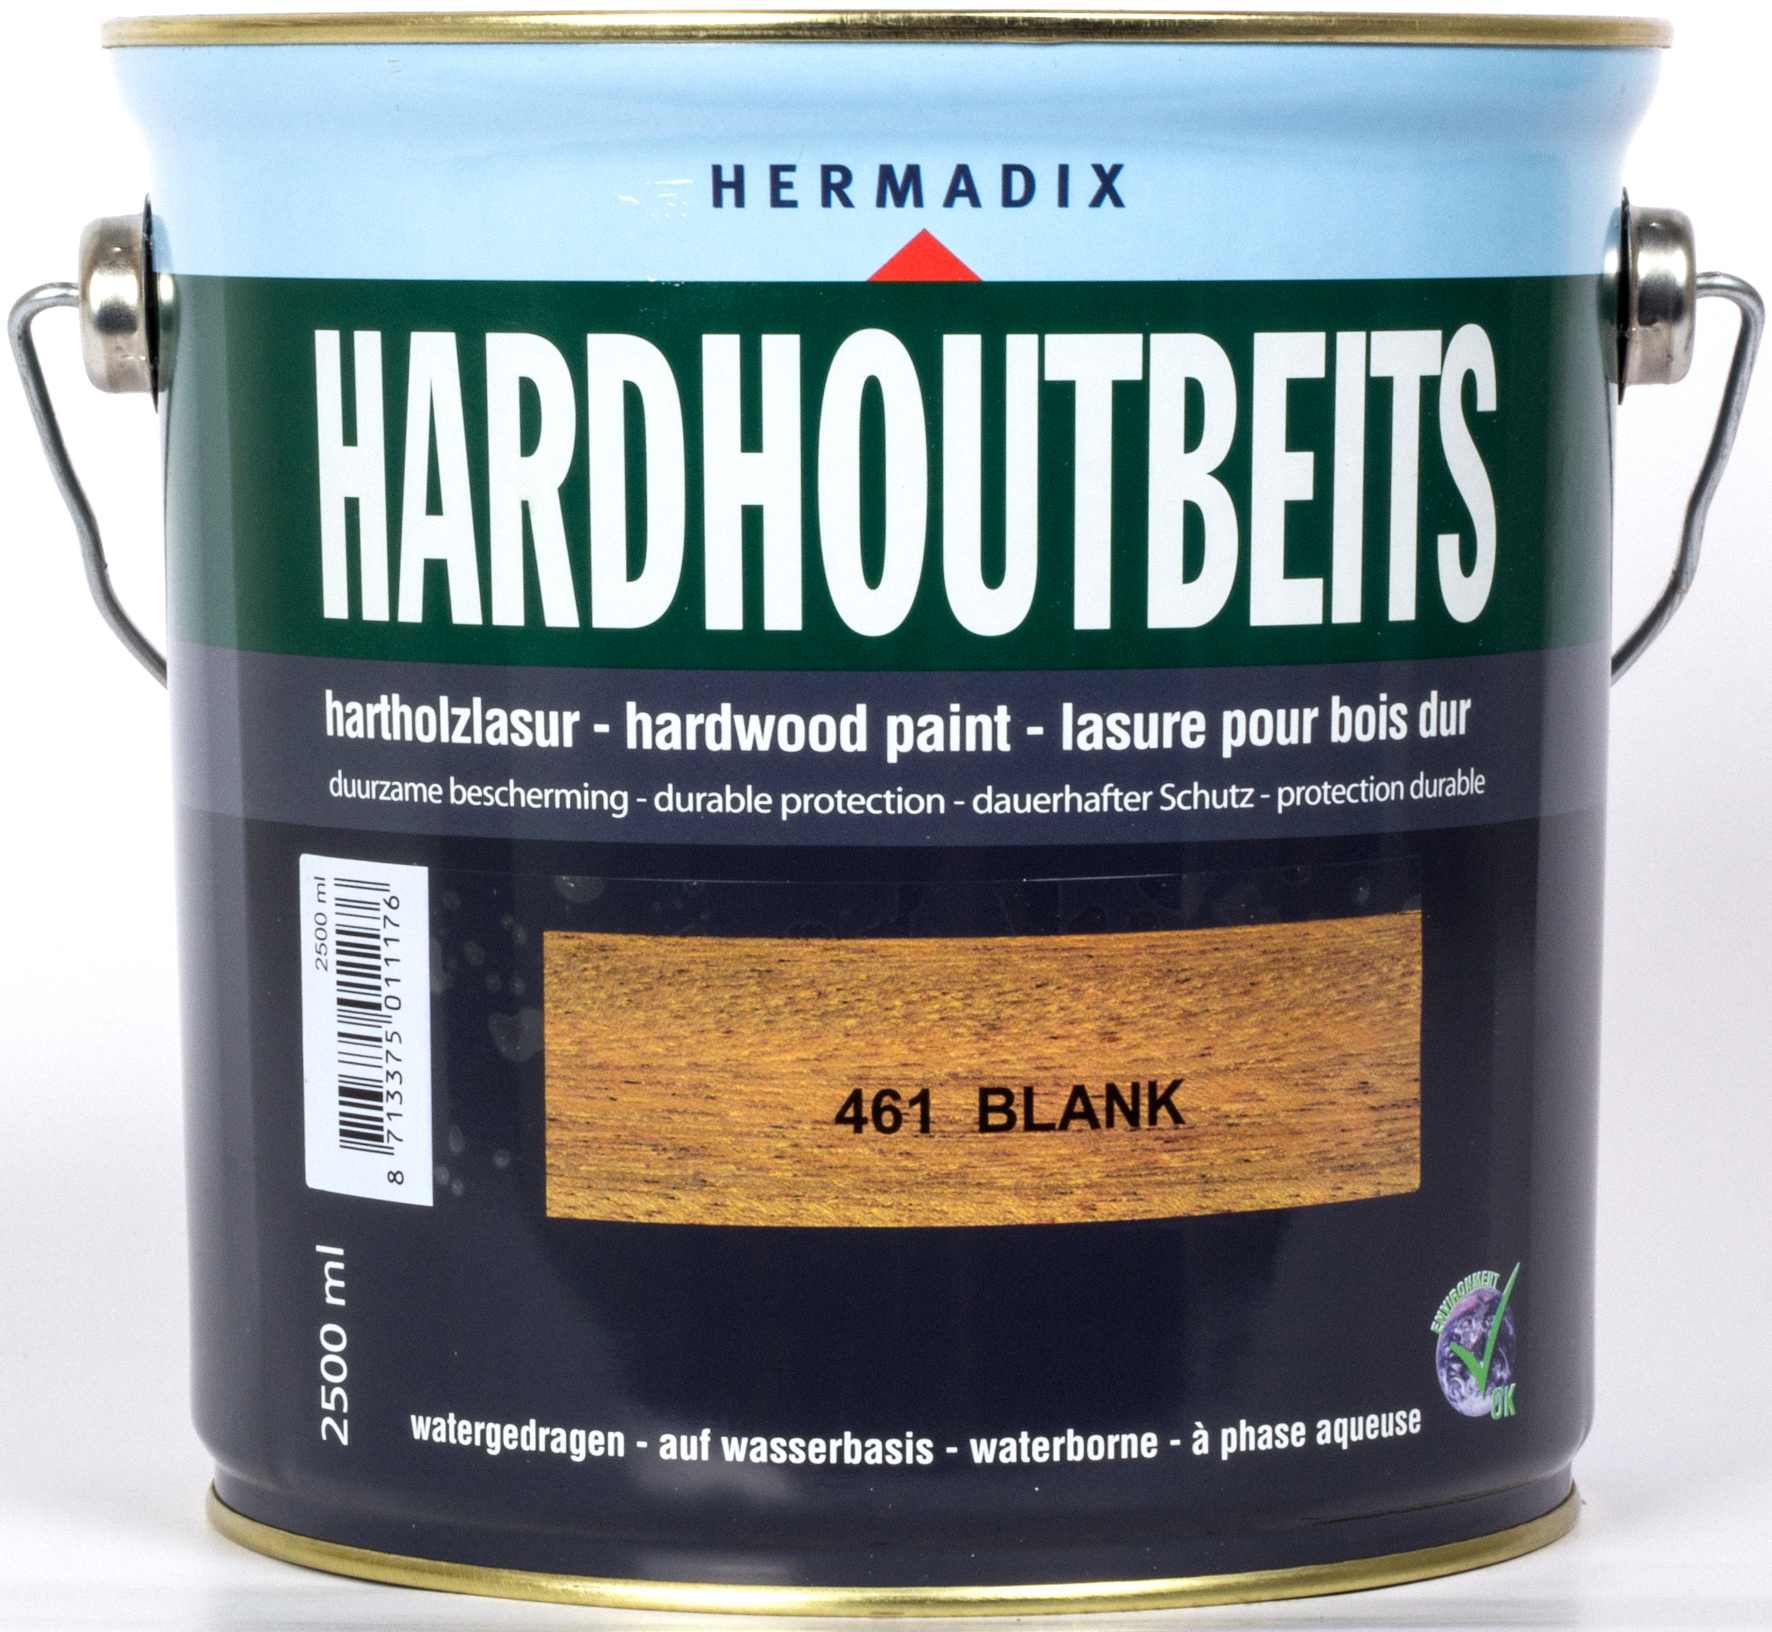 Hermadix Hardhoutbeits 461 Blank 25 L